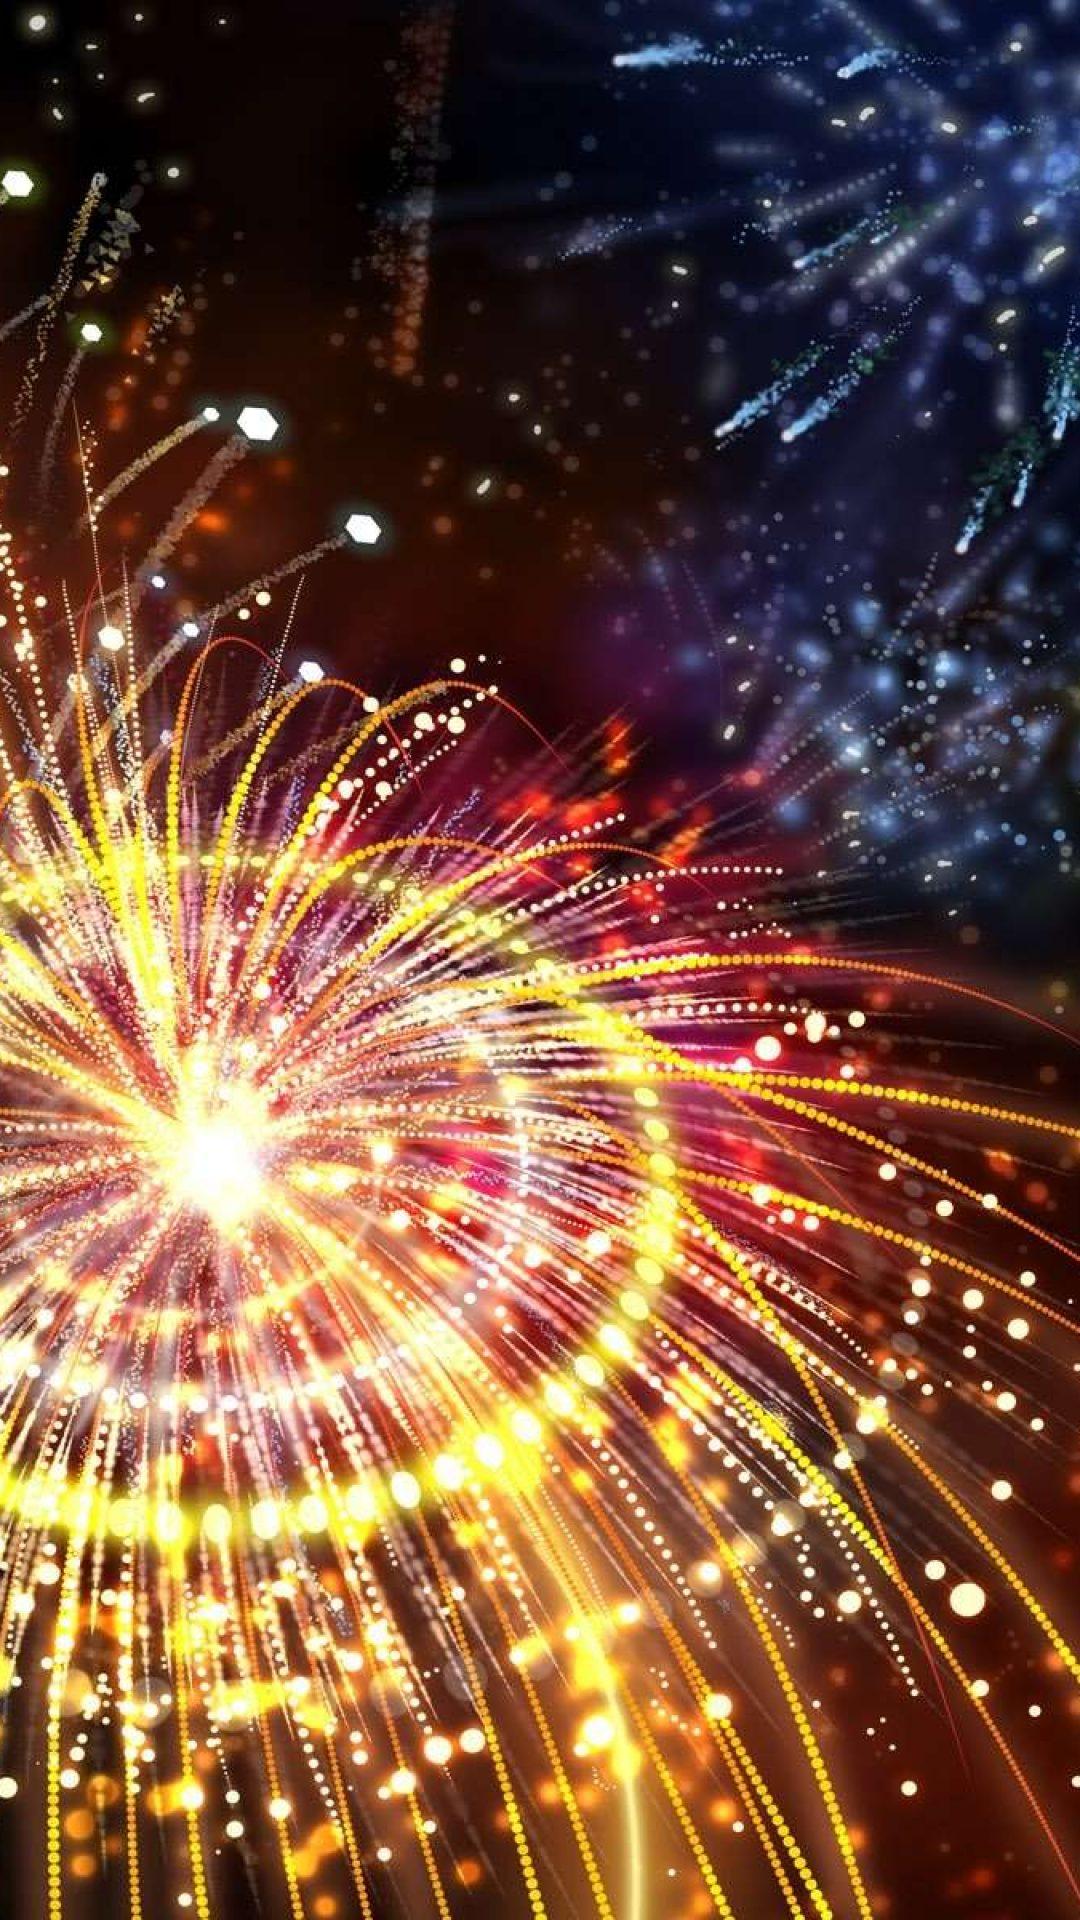 New Years Eve Desktop Wallpaper - WallpaperSafari  New Years Eve D...